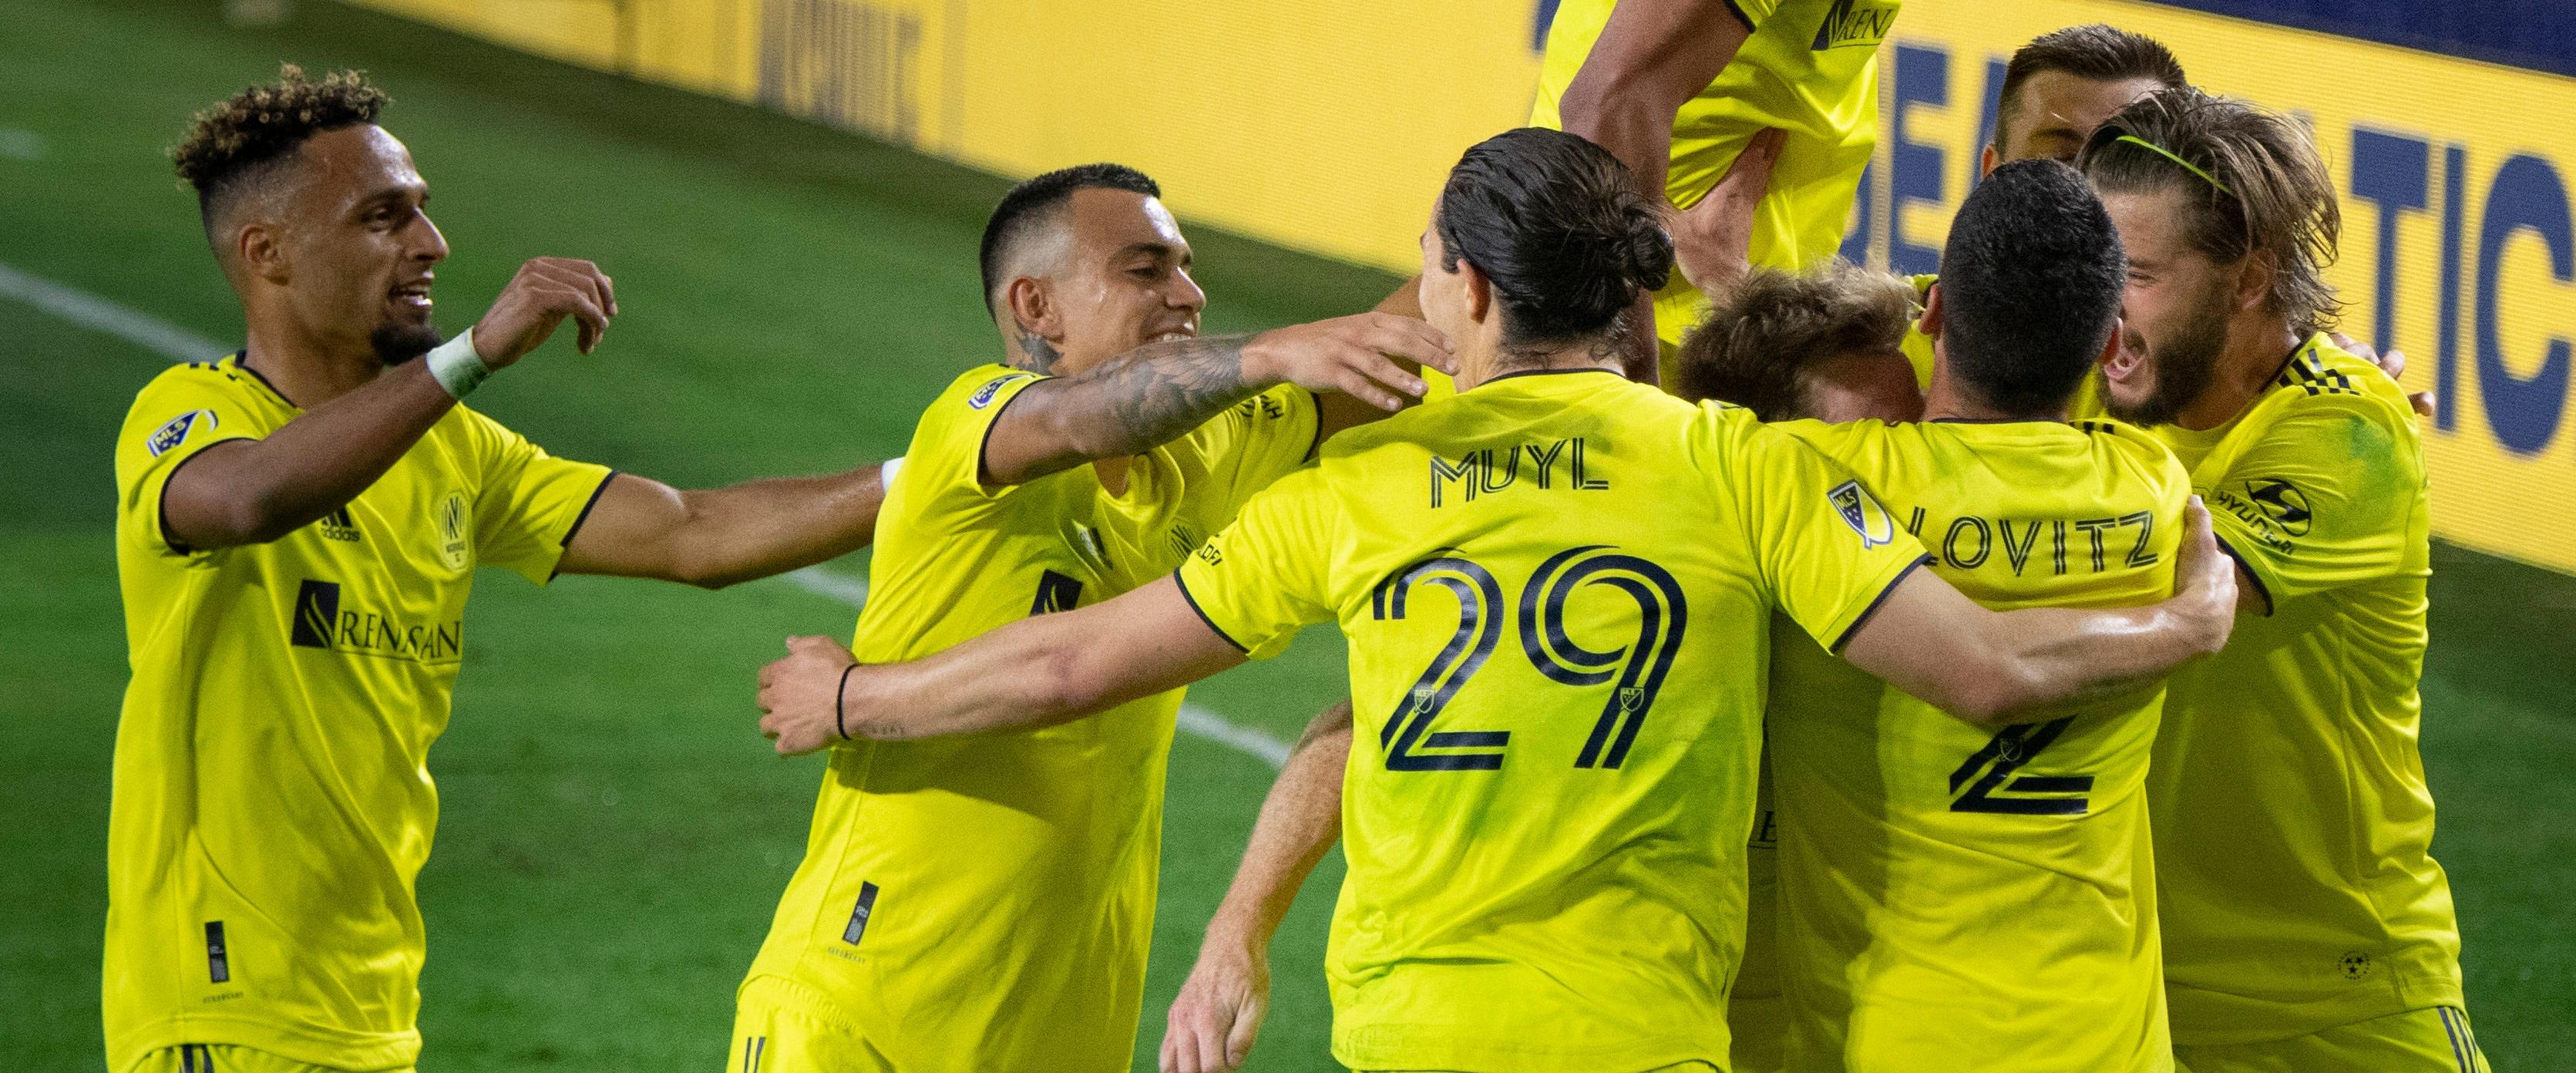 Toronto FC - Nashville SC preview